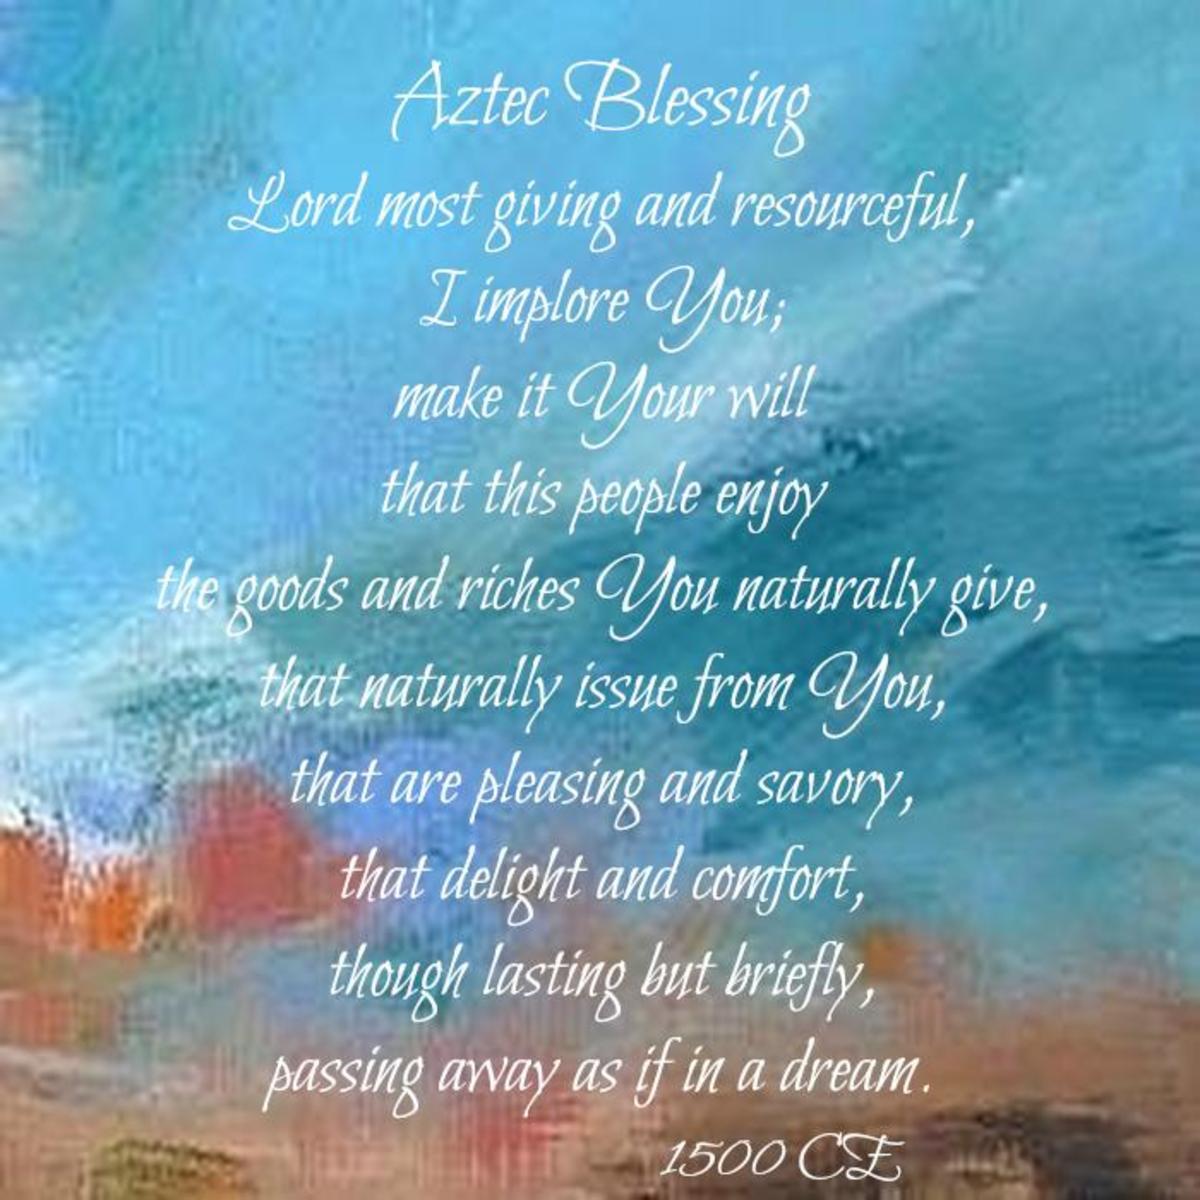 Aztec Blessing of Gratitude